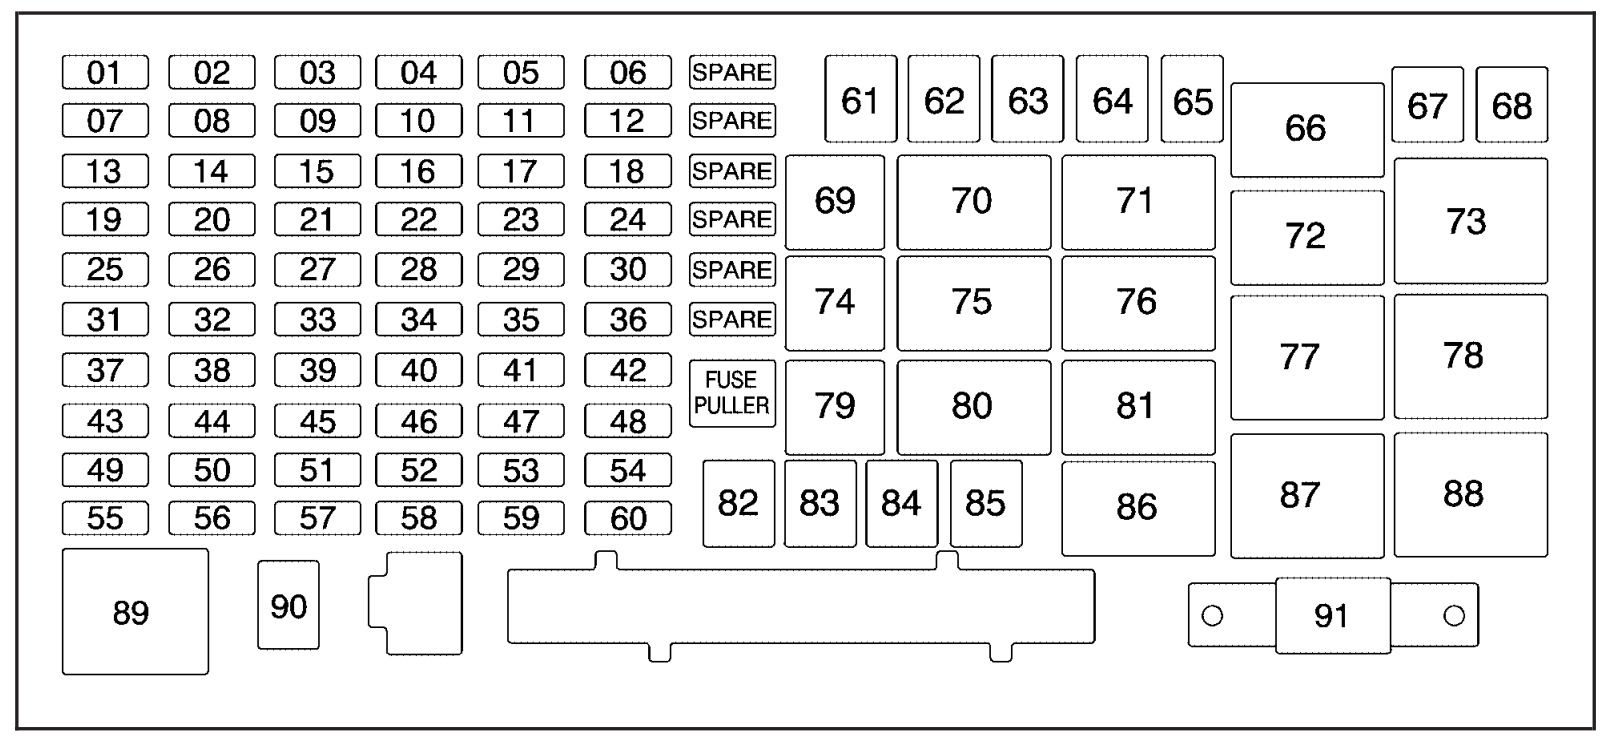 2005 Hummer Fuse Panel Diagram Wiring Diagram Balance Balance Zaafran It